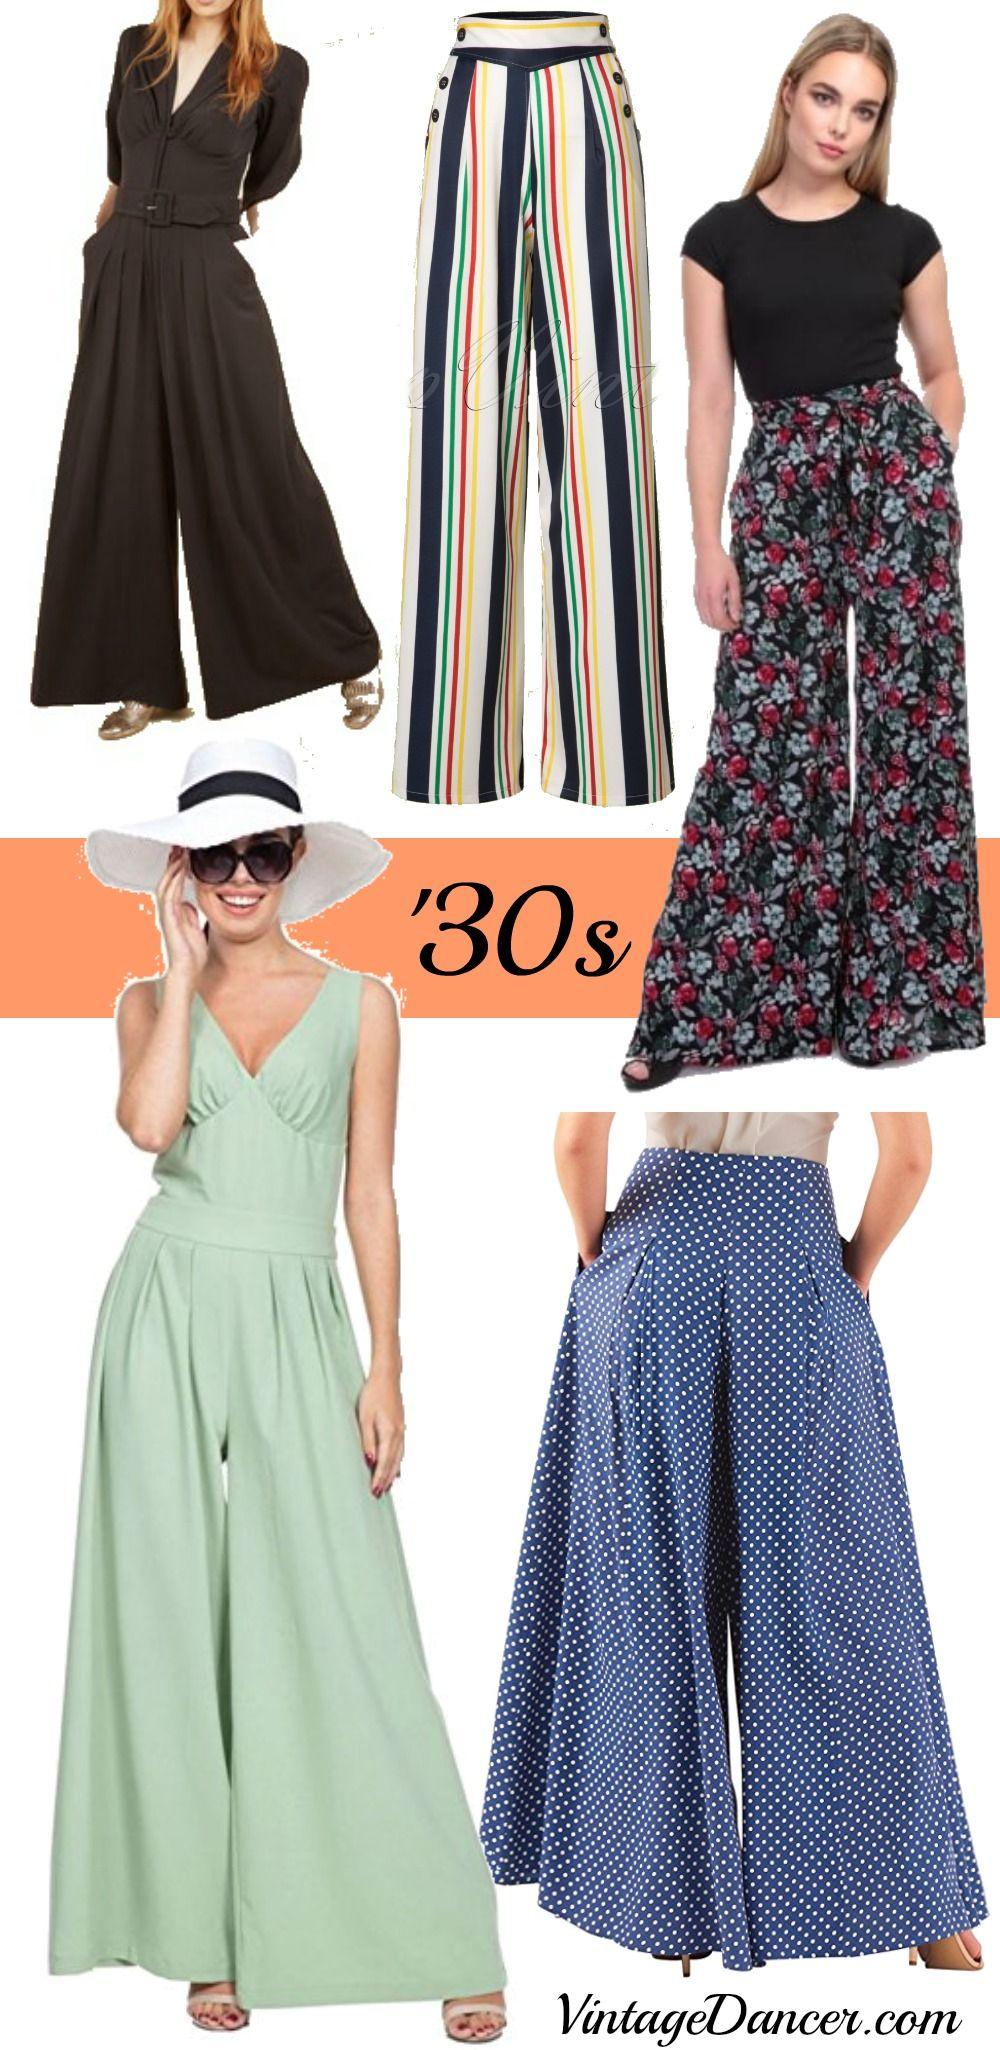 9ffedb073ca6 1930s Women s Pants and Beach Pajamas